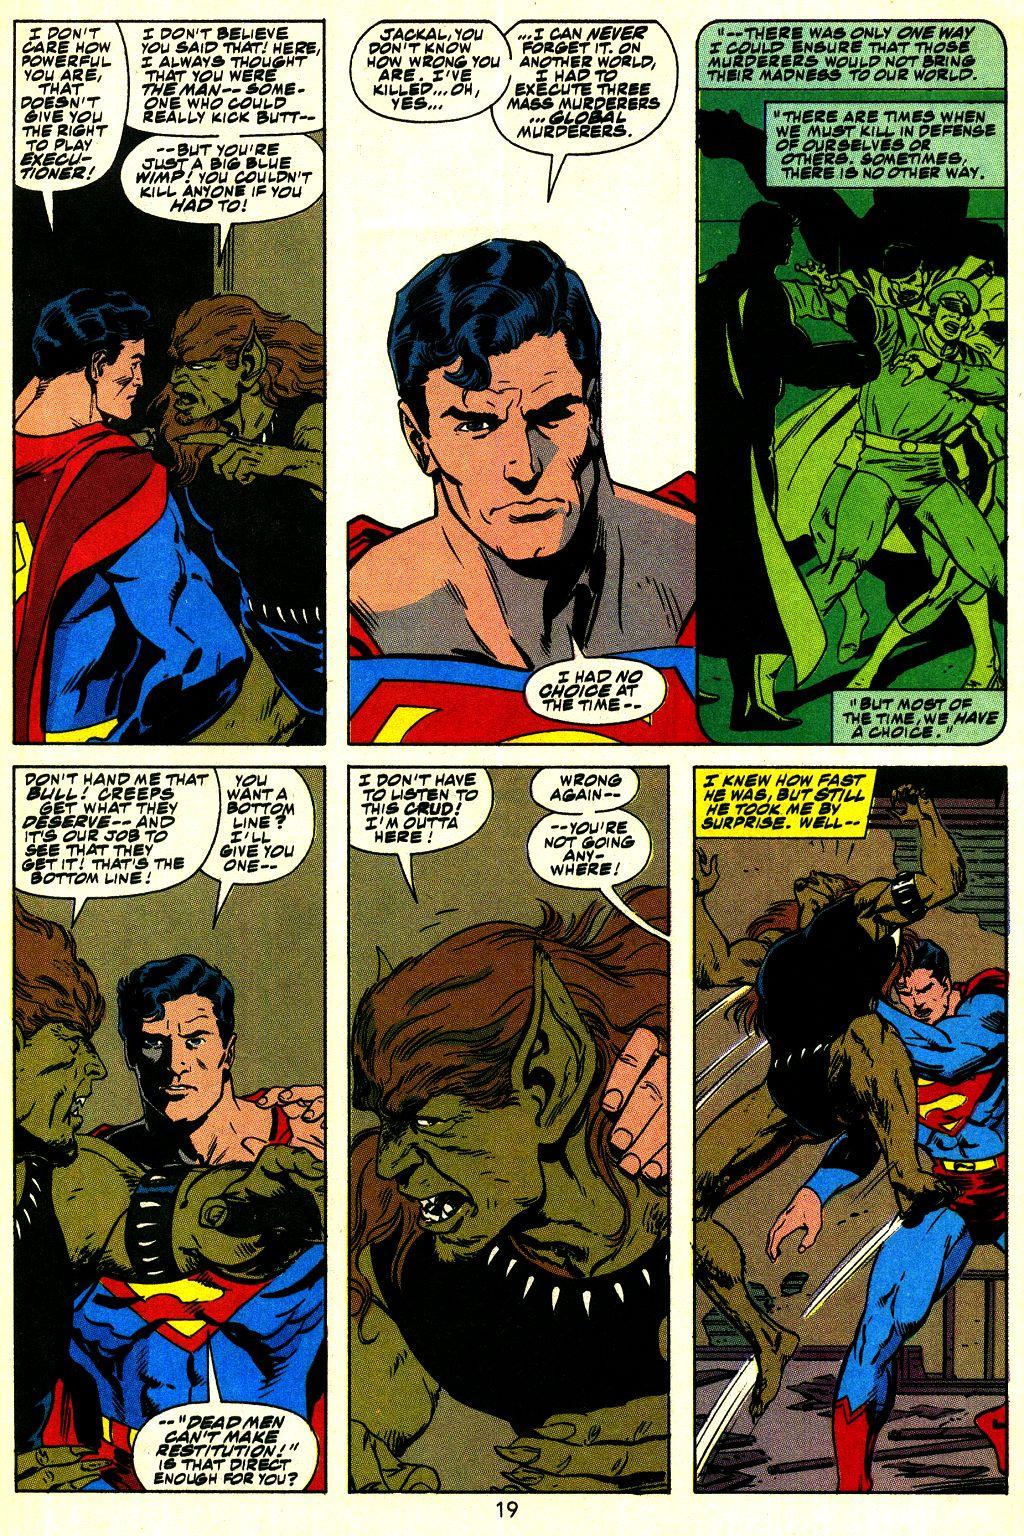 Action Comics (1938) 683 Page 19